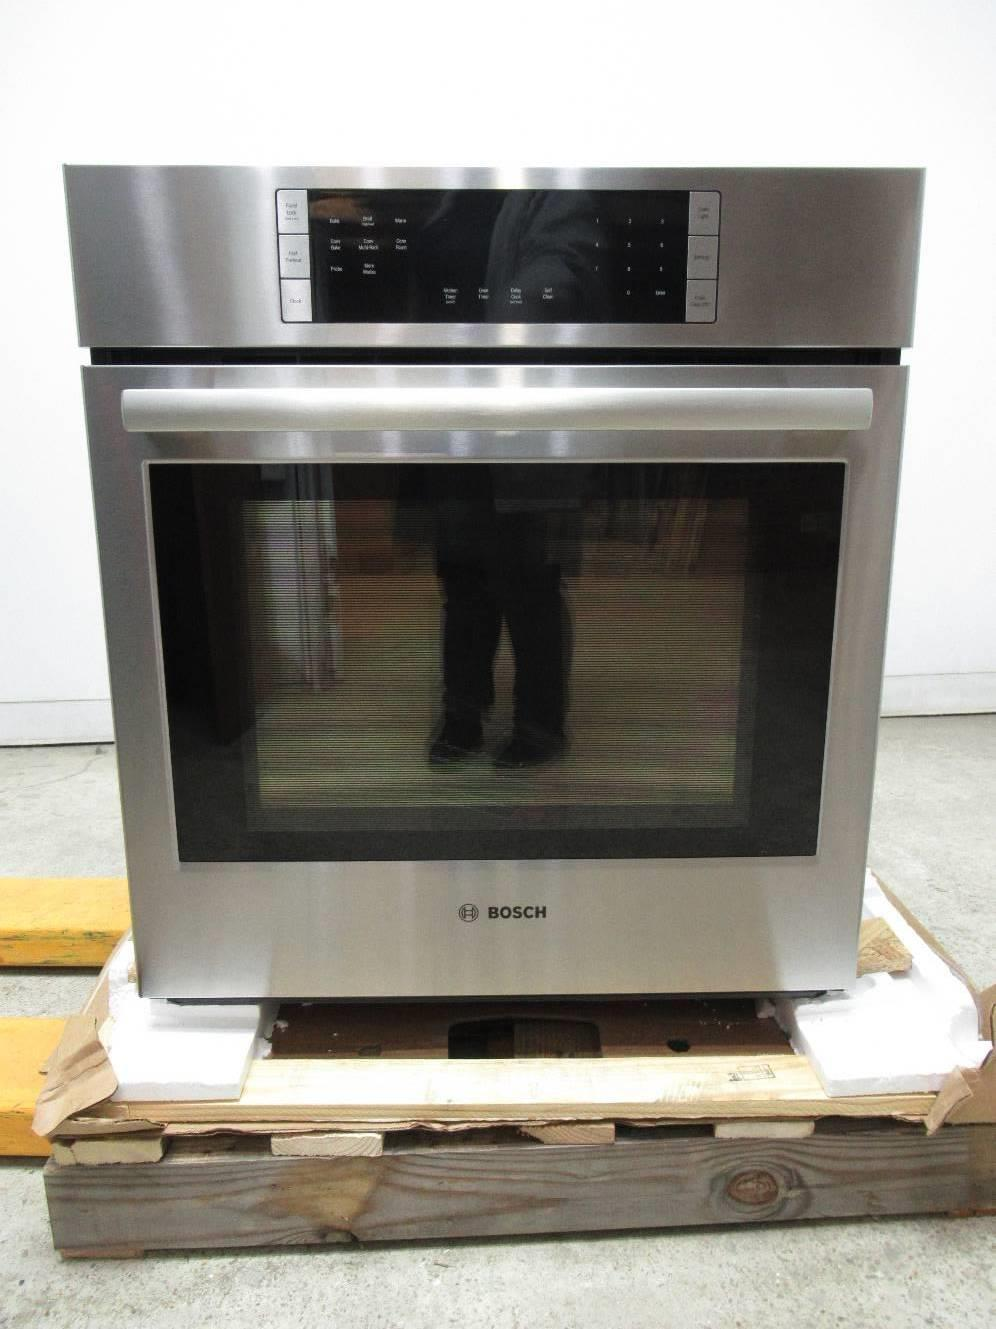 Details About Bosch 800 27 Convection Oven Sd Combination Hbn8451uc Hmc87152uc